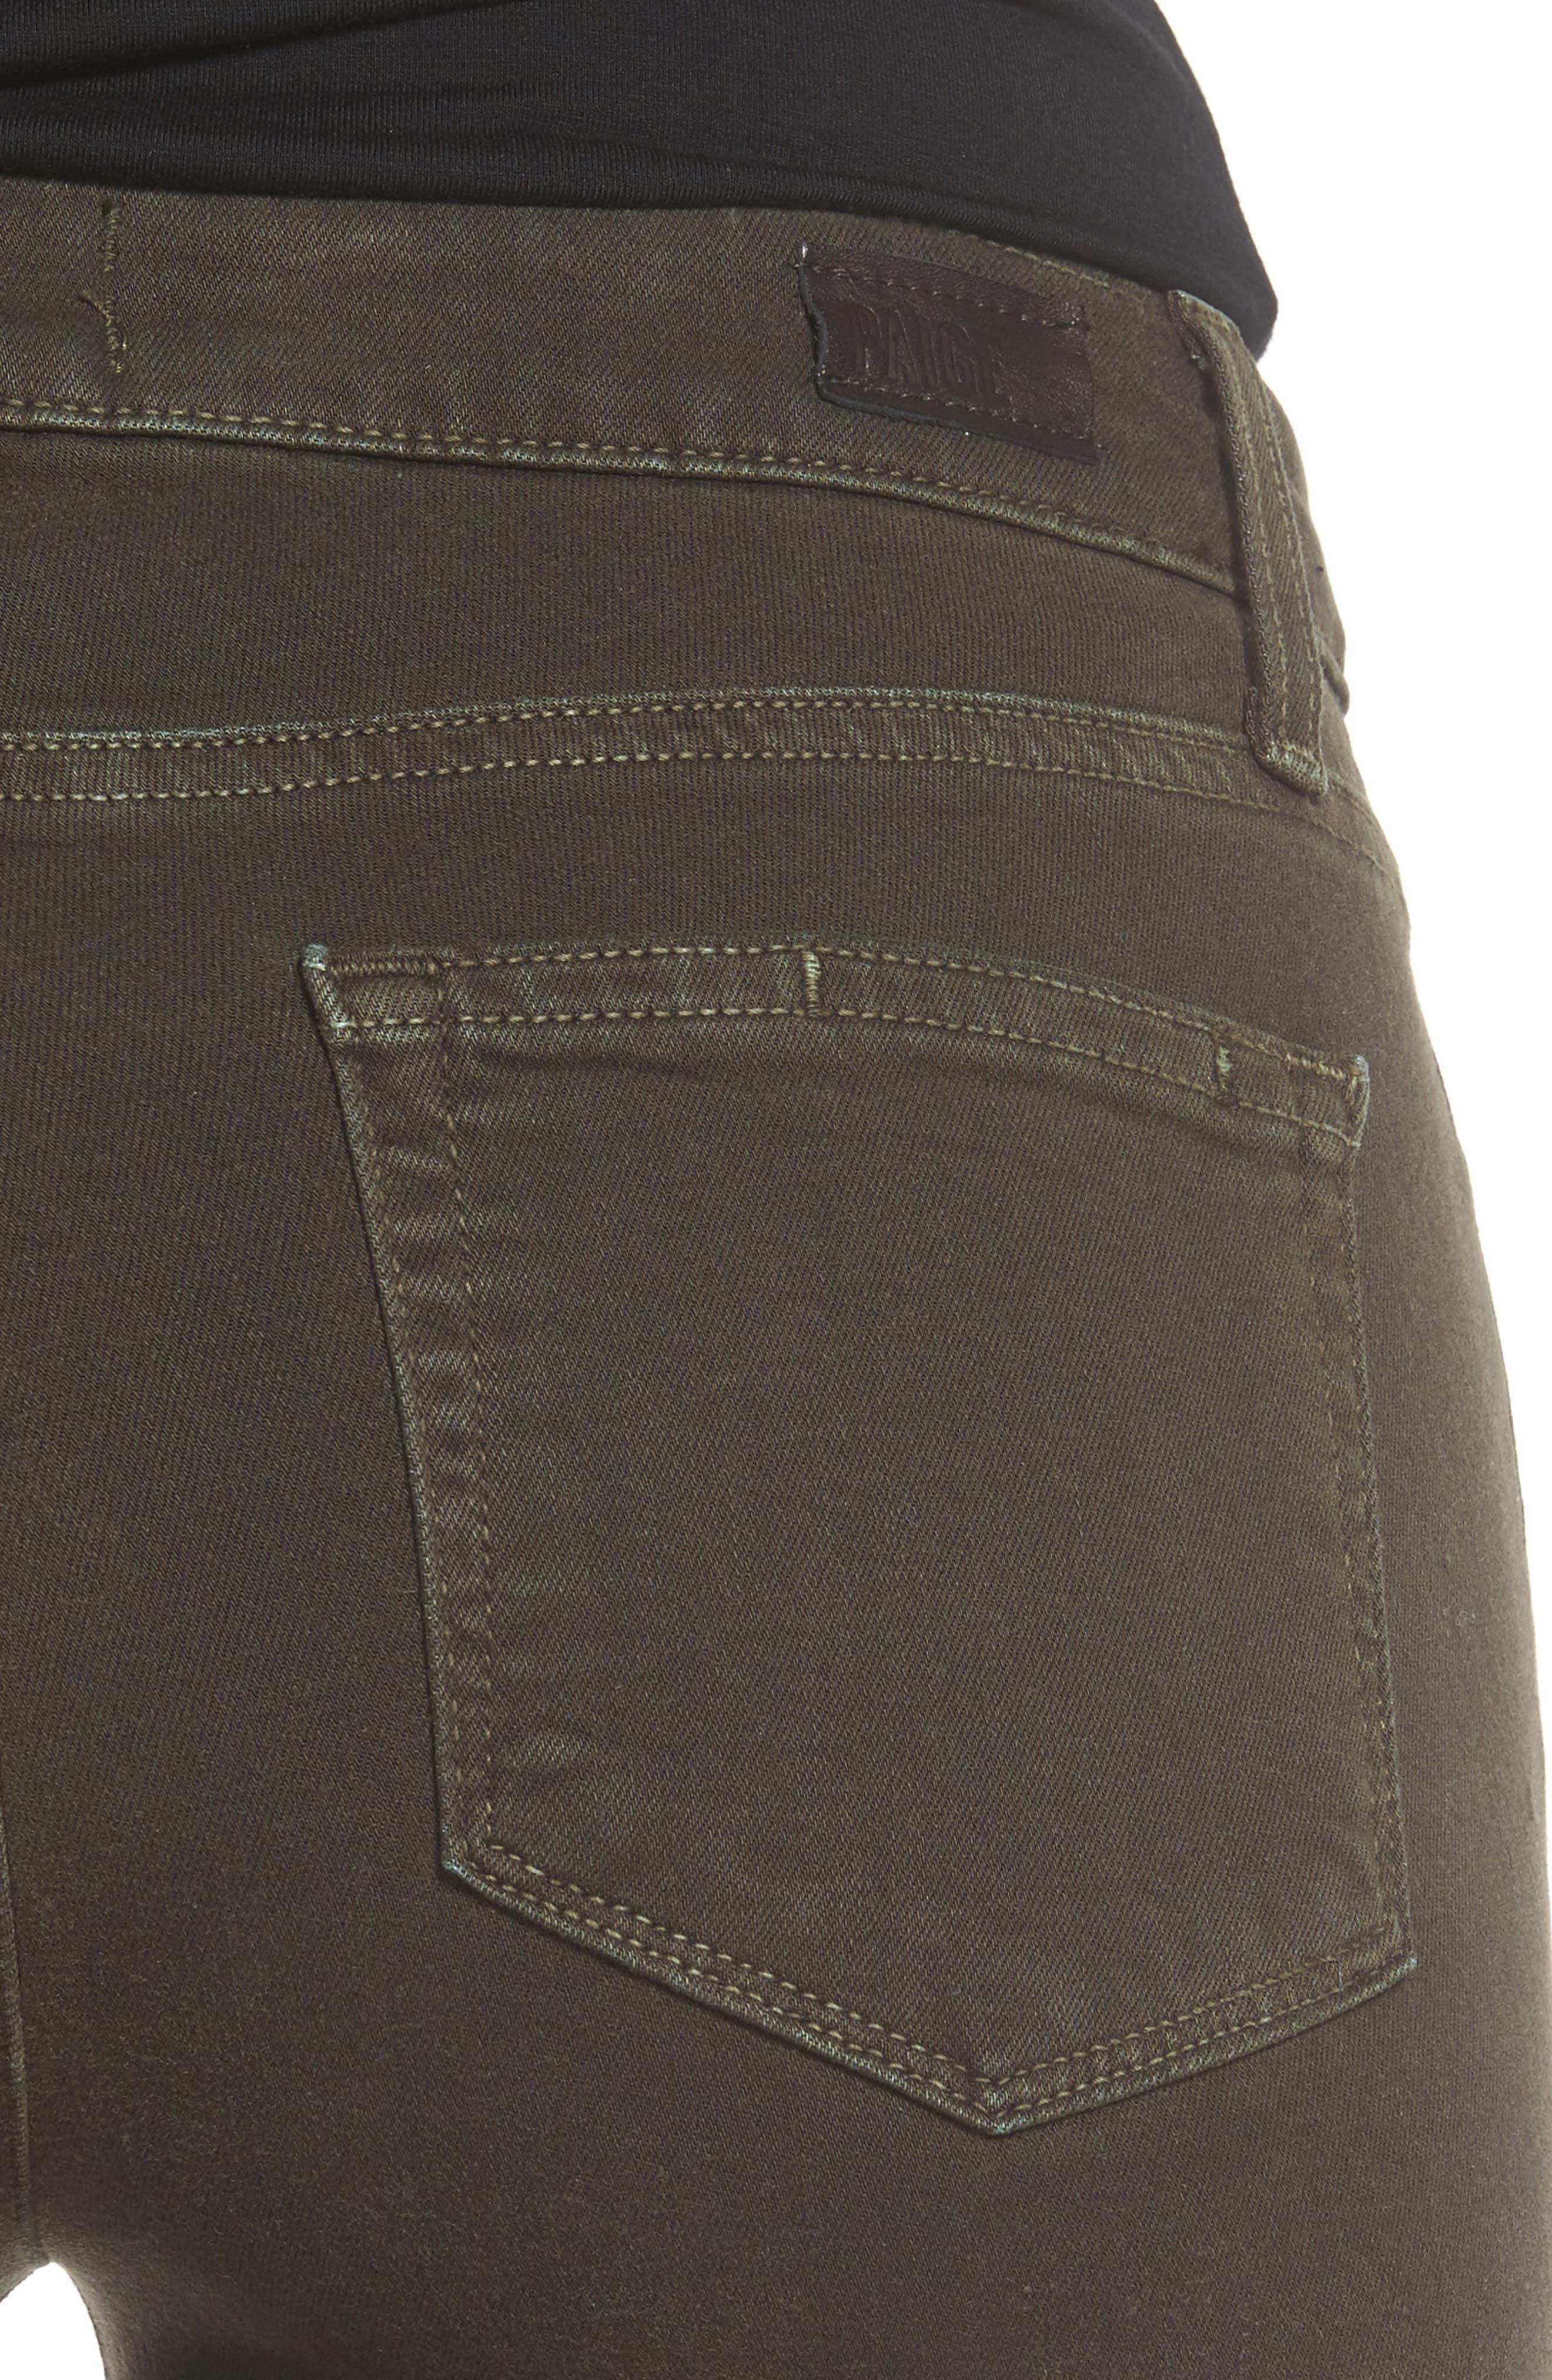 Transcend - Verdugo Ankle Skinny Jeans,                             Alternate thumbnail 4, color,                             Deep Juniper